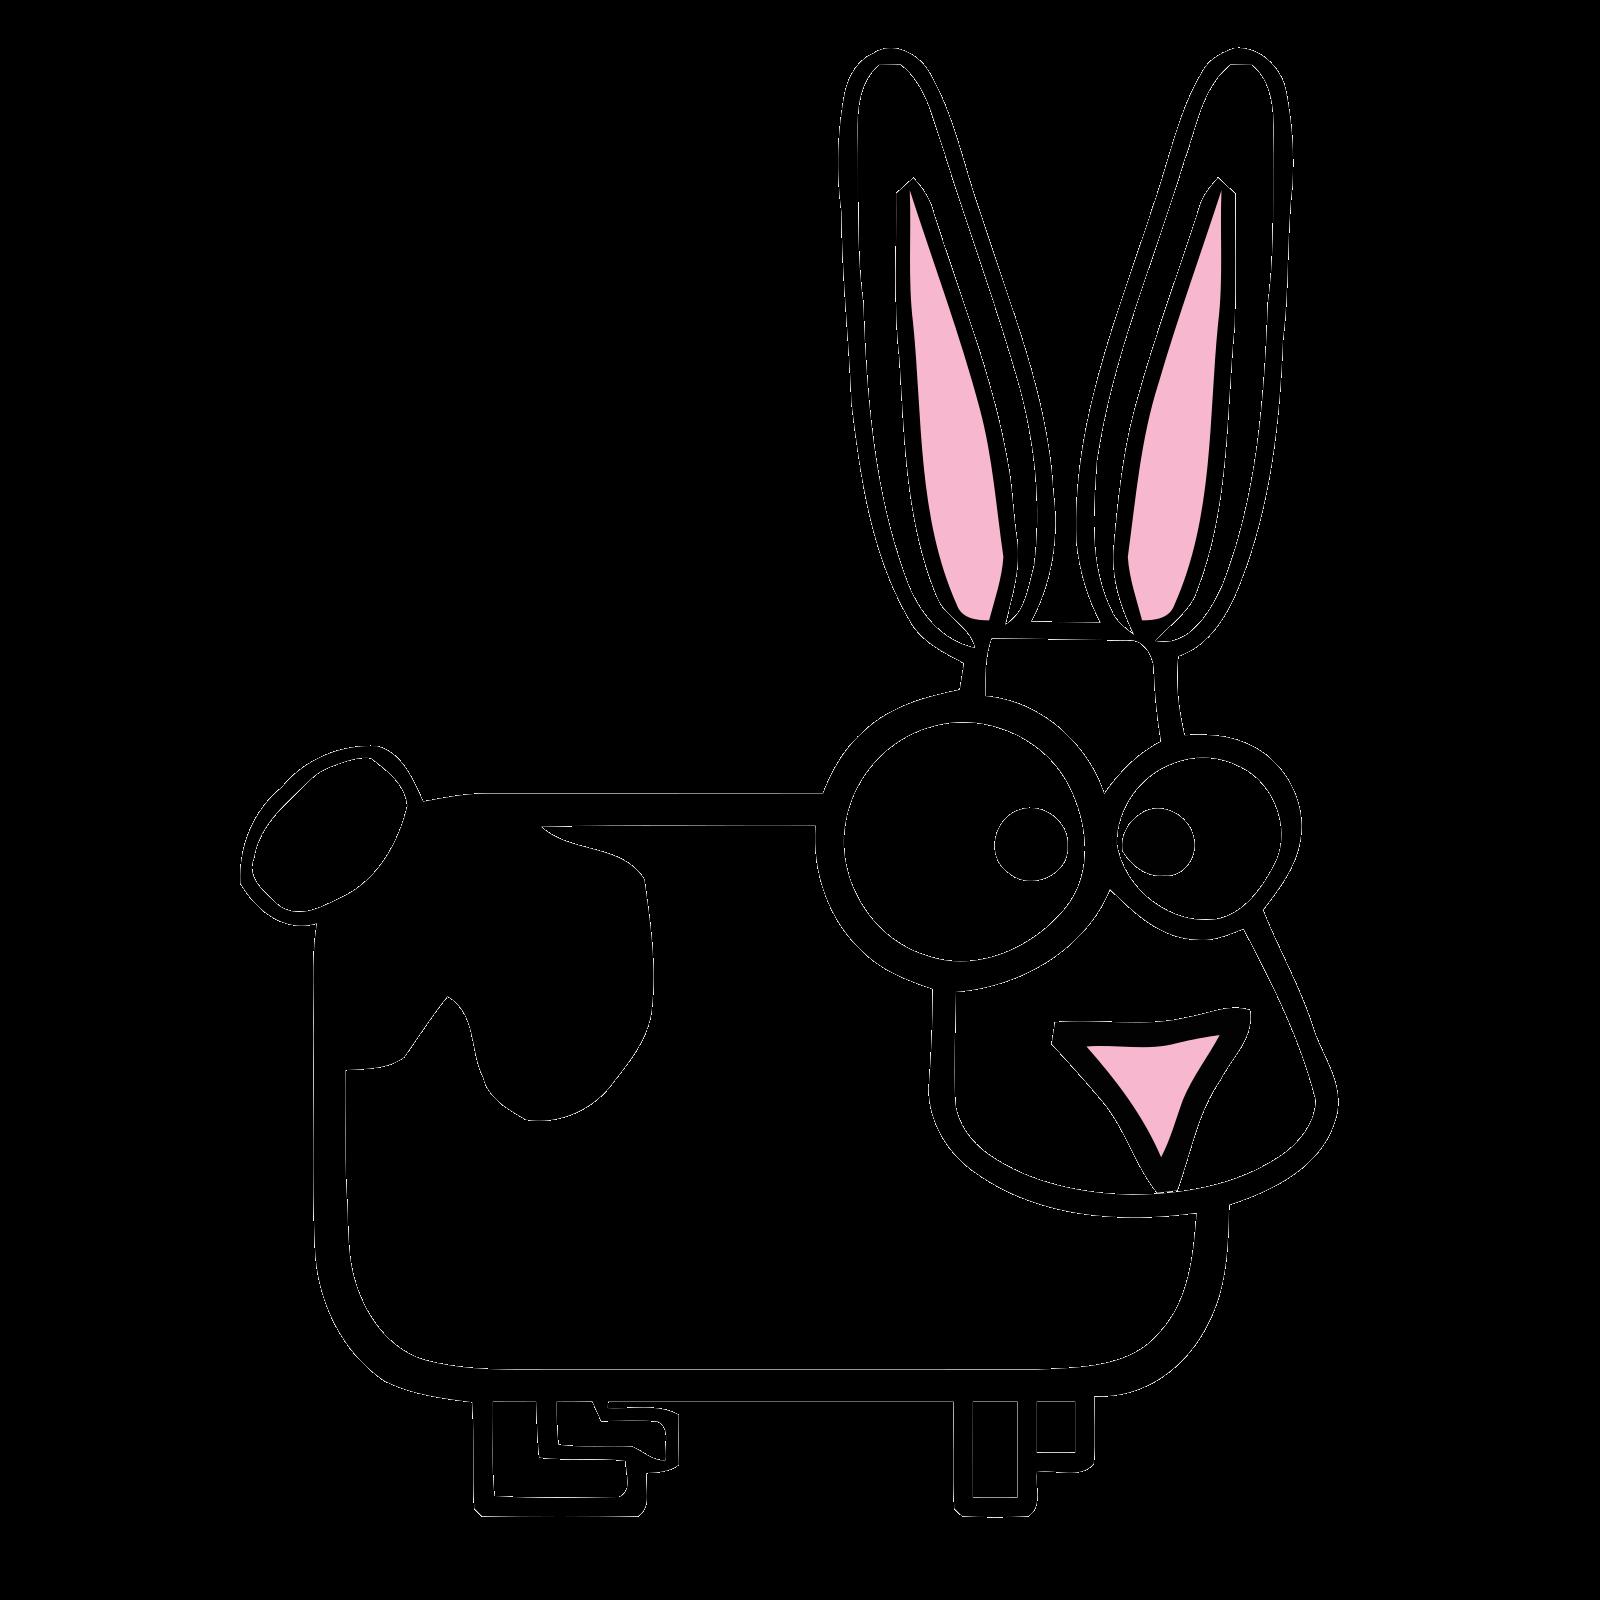 Bunny Clipart Jumping Cartoon - Rabbit Cartoon Png, Transparent Png ,  Transparent Png Image - PNGitem